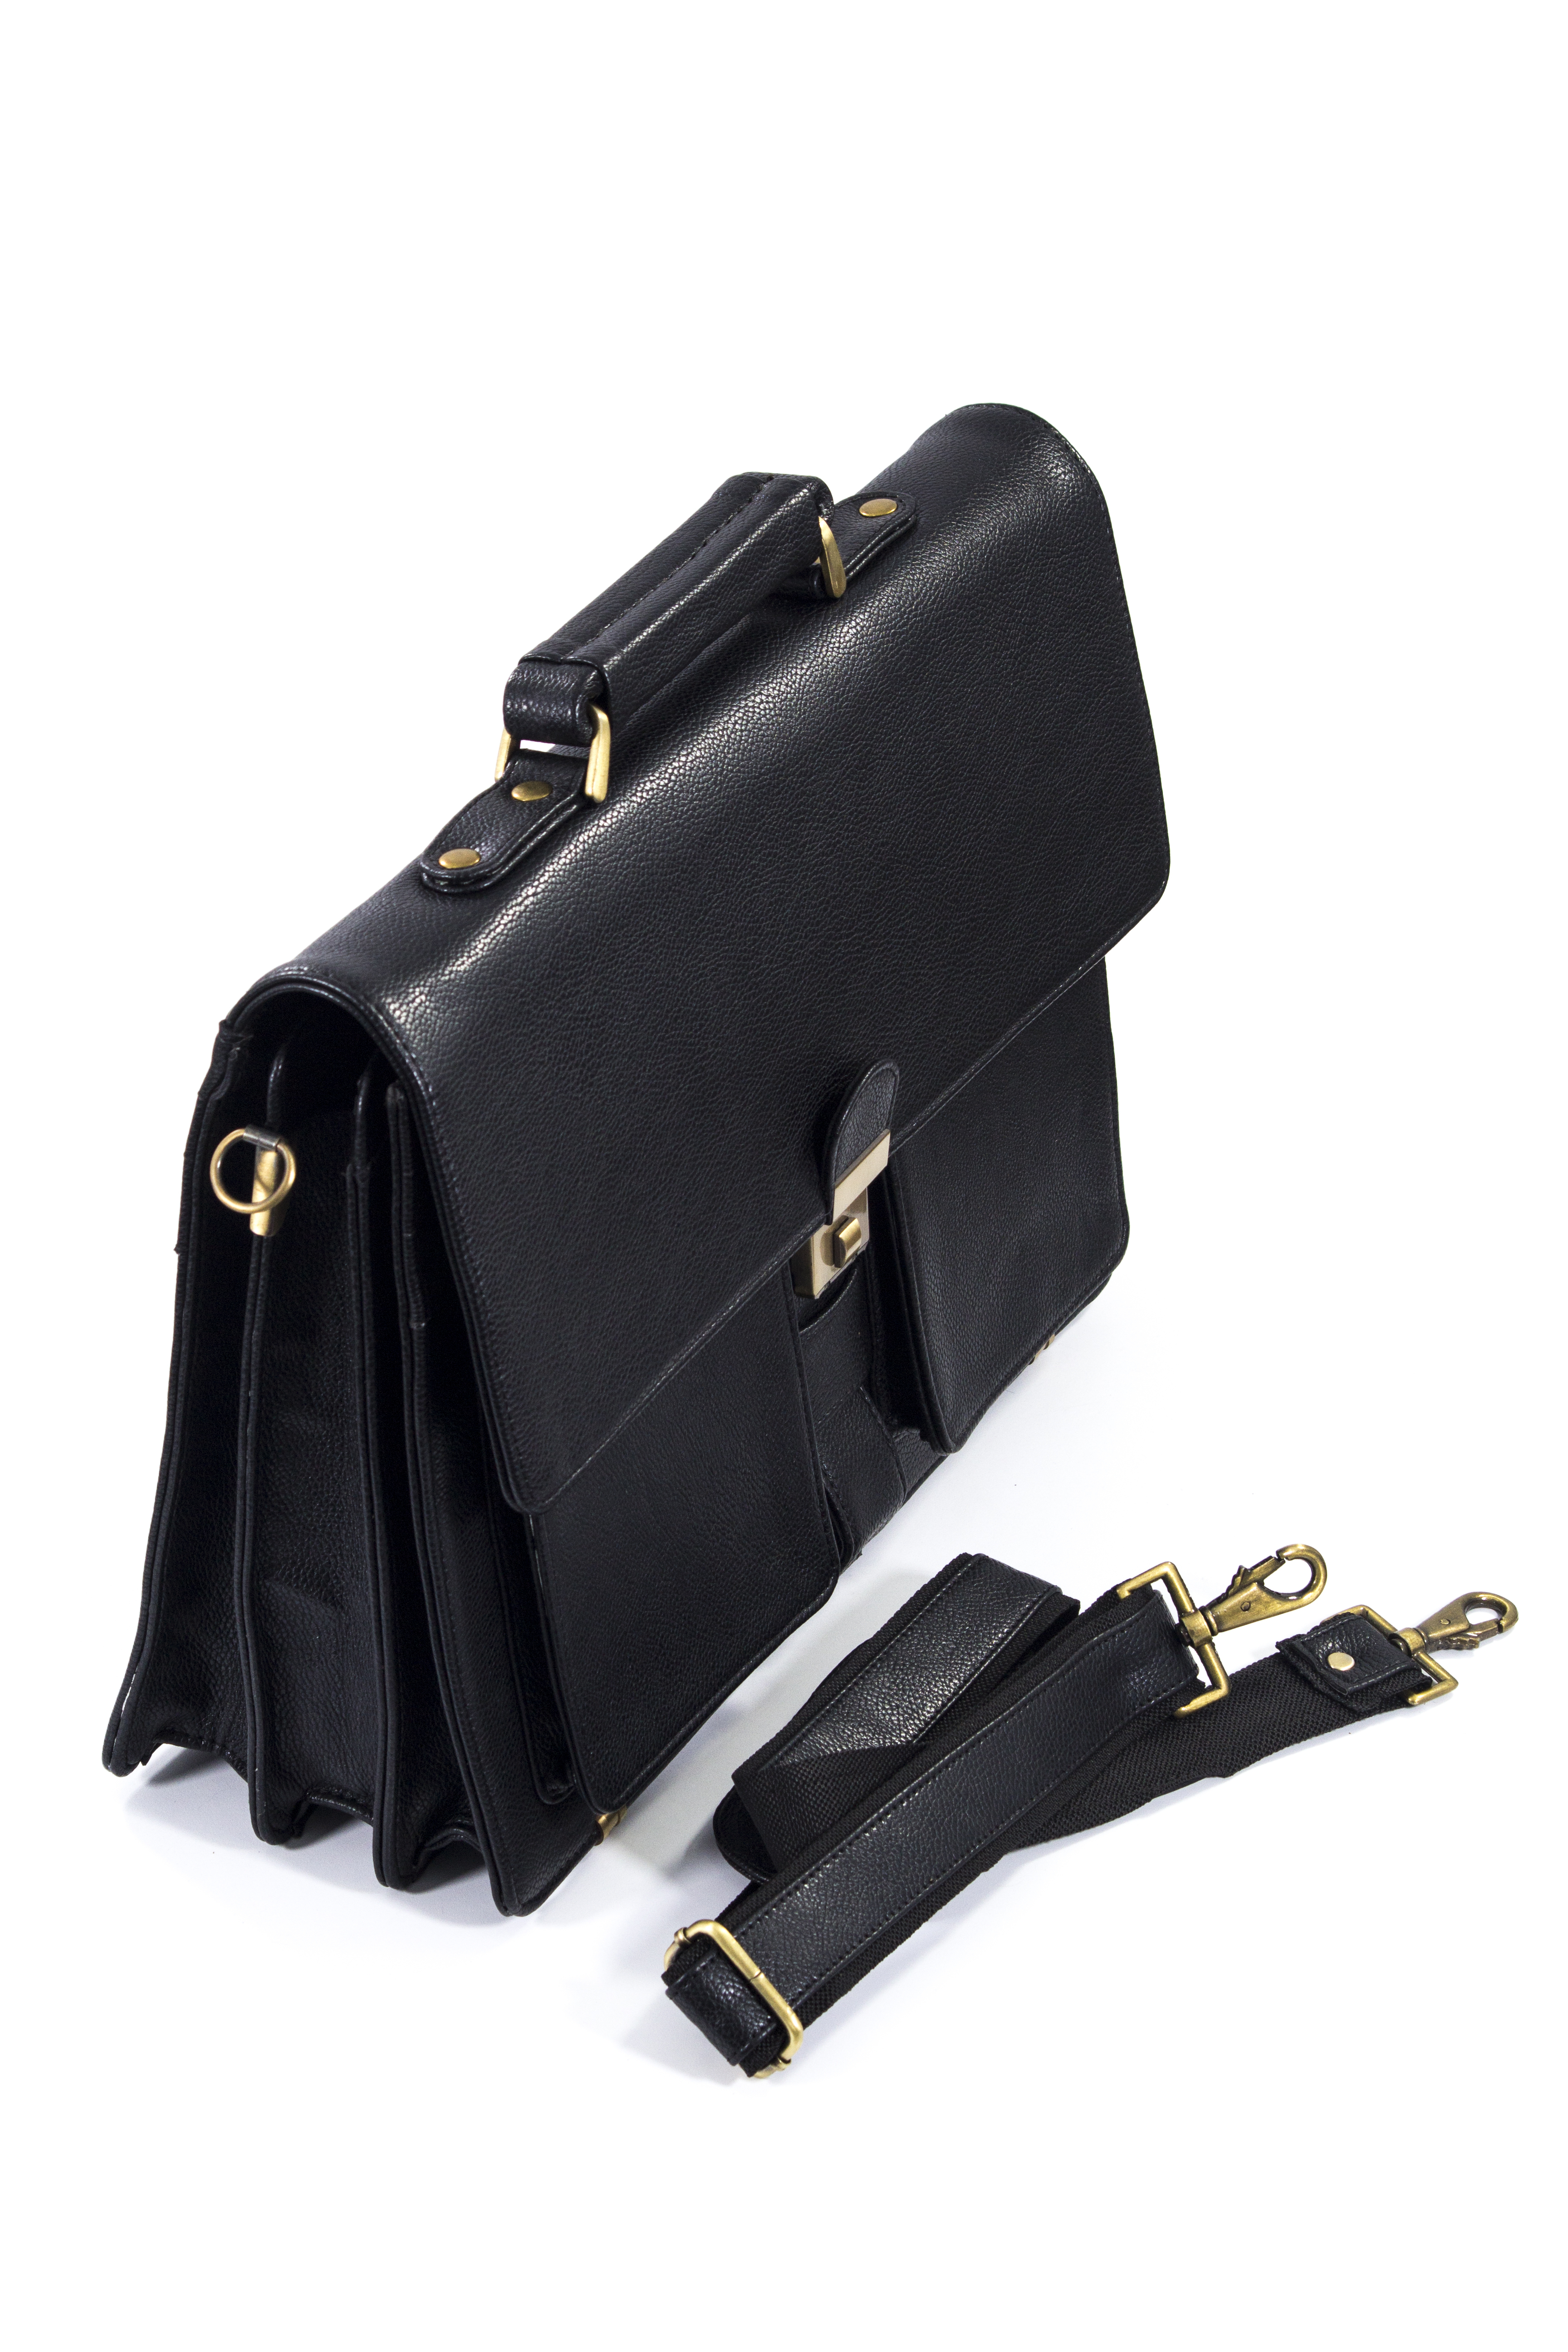 Leatherette Executive Laptop Bag